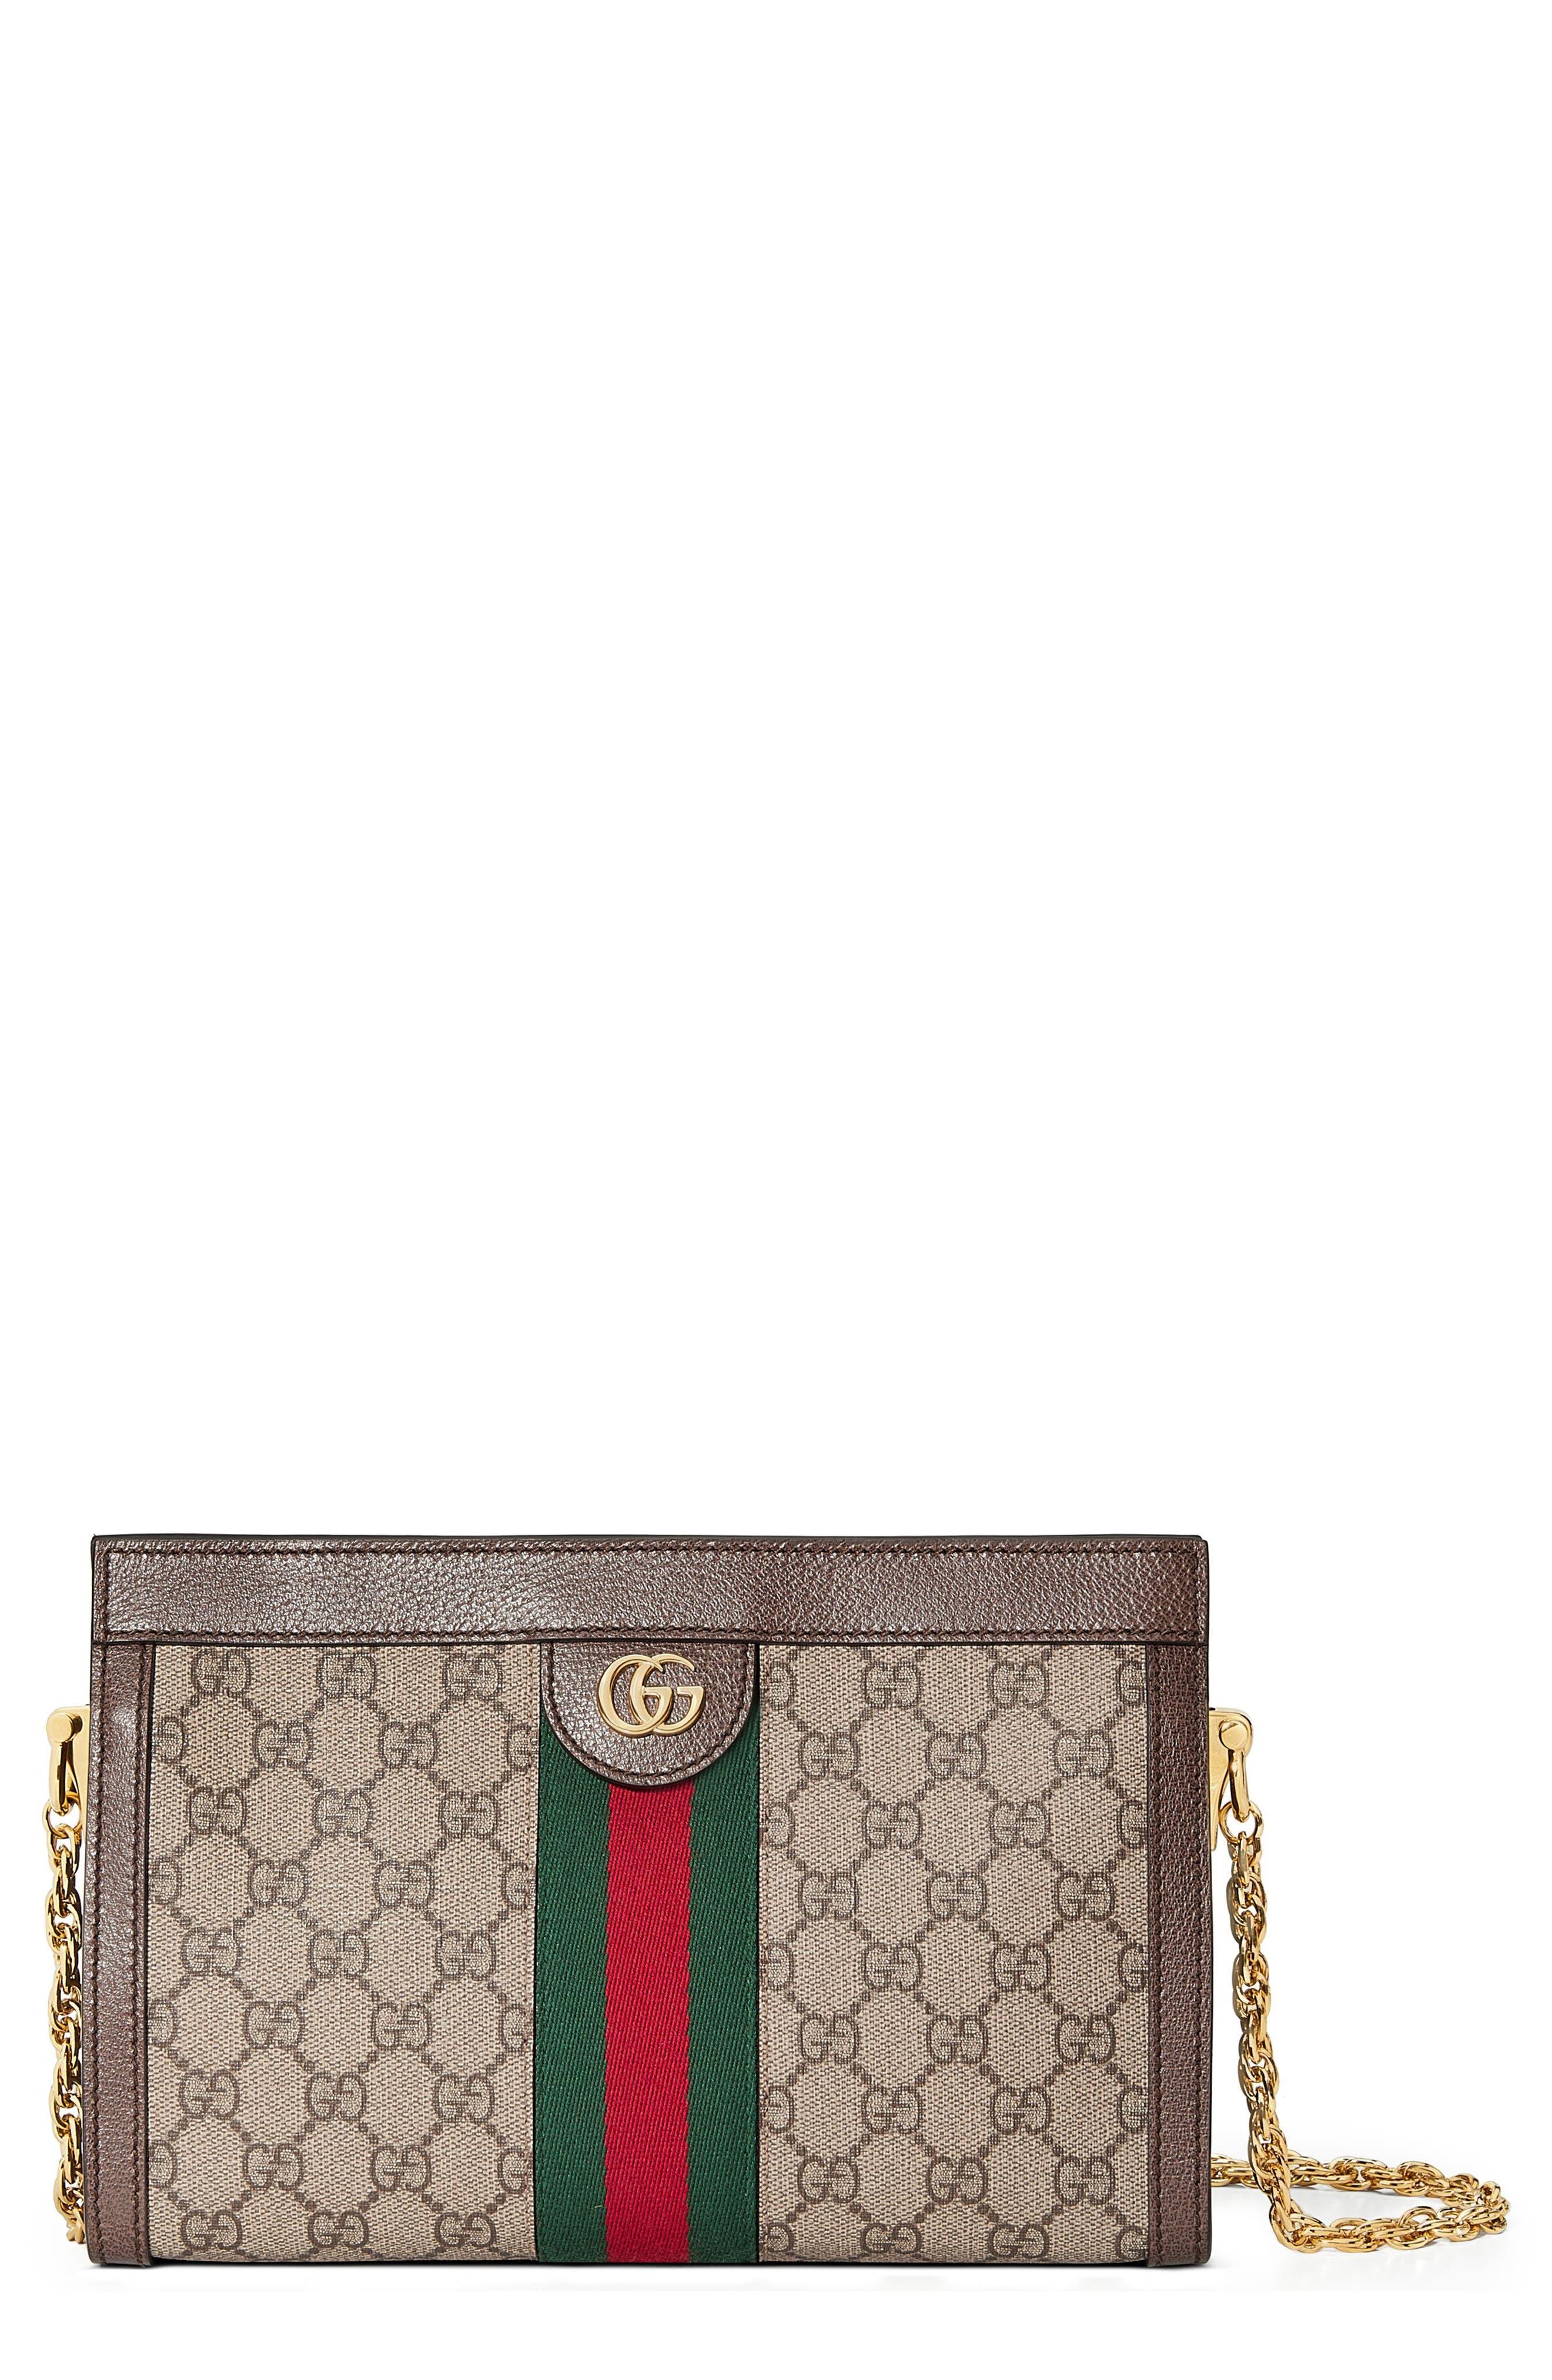 Small GG Supreme Shoulder Bag,                             Main thumbnail 1, color,                             BEIGE EBONY/ NERO/ VERT/ RED